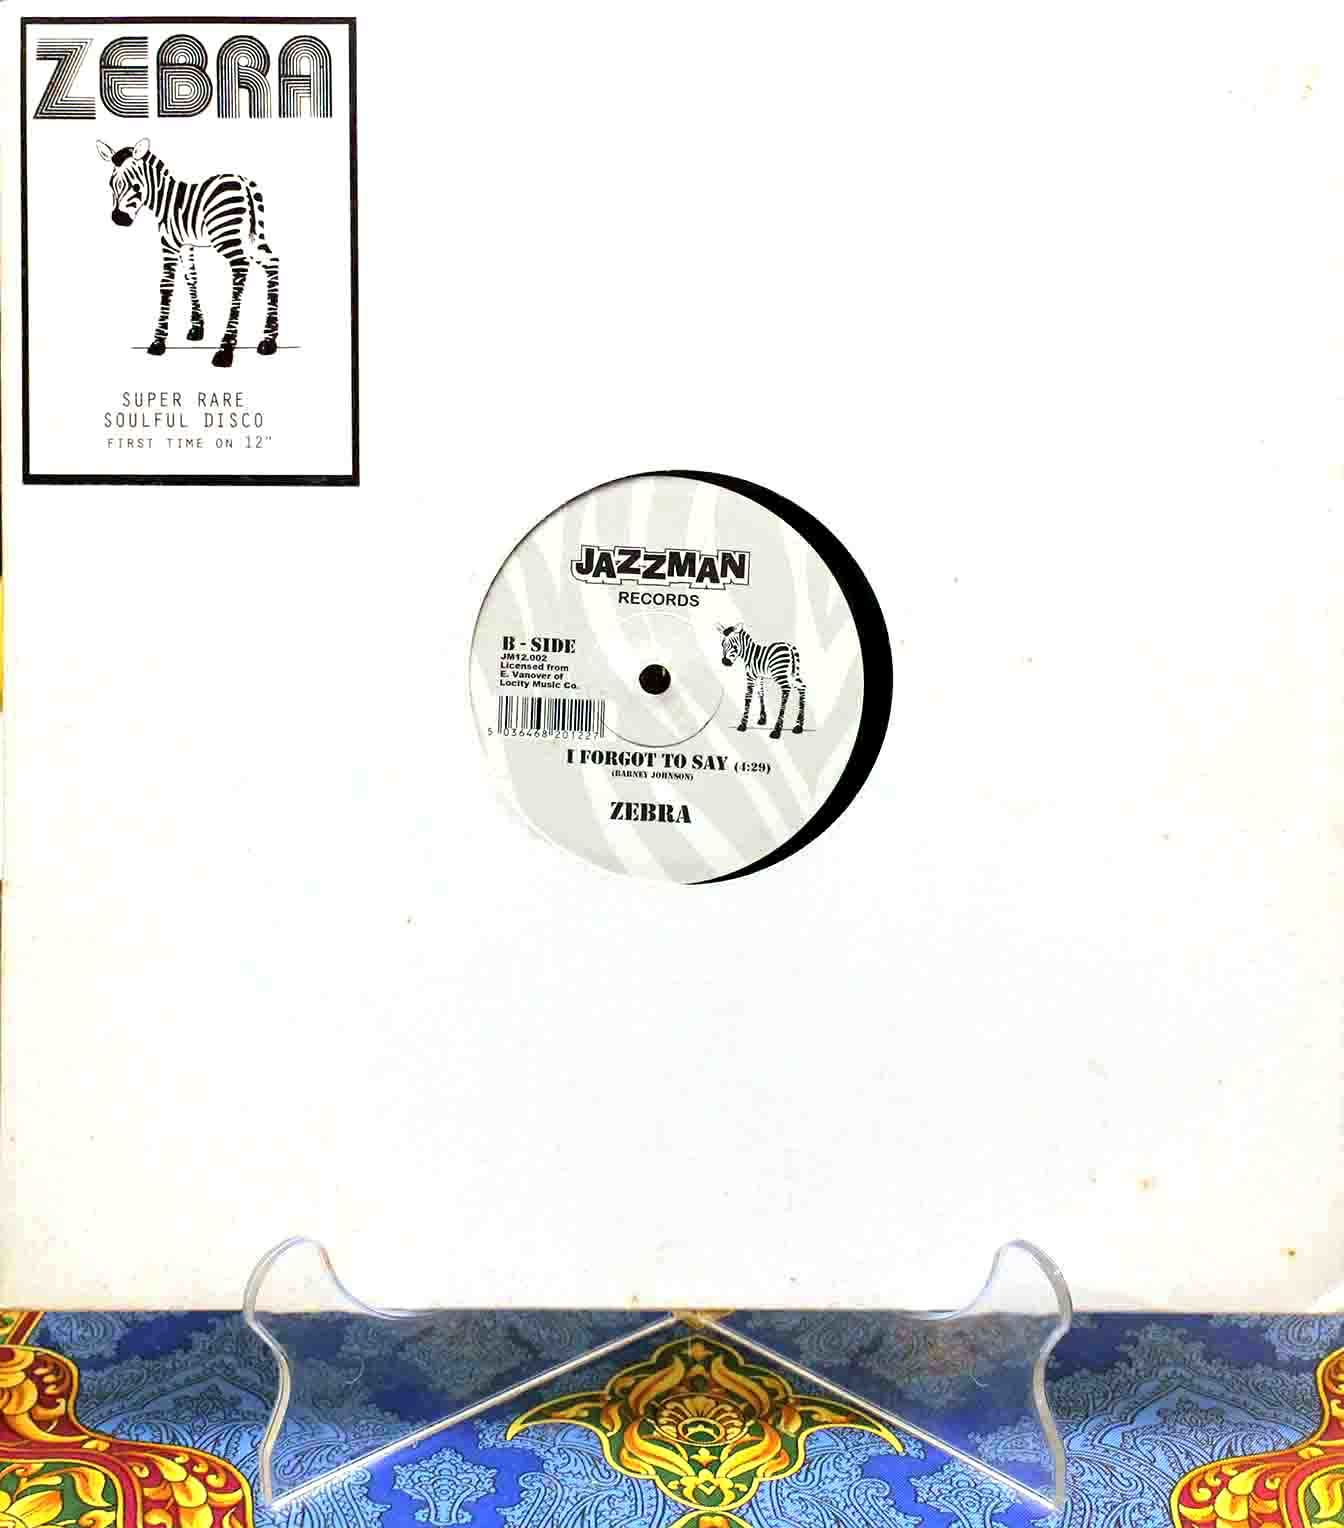 zebra - simple song 01